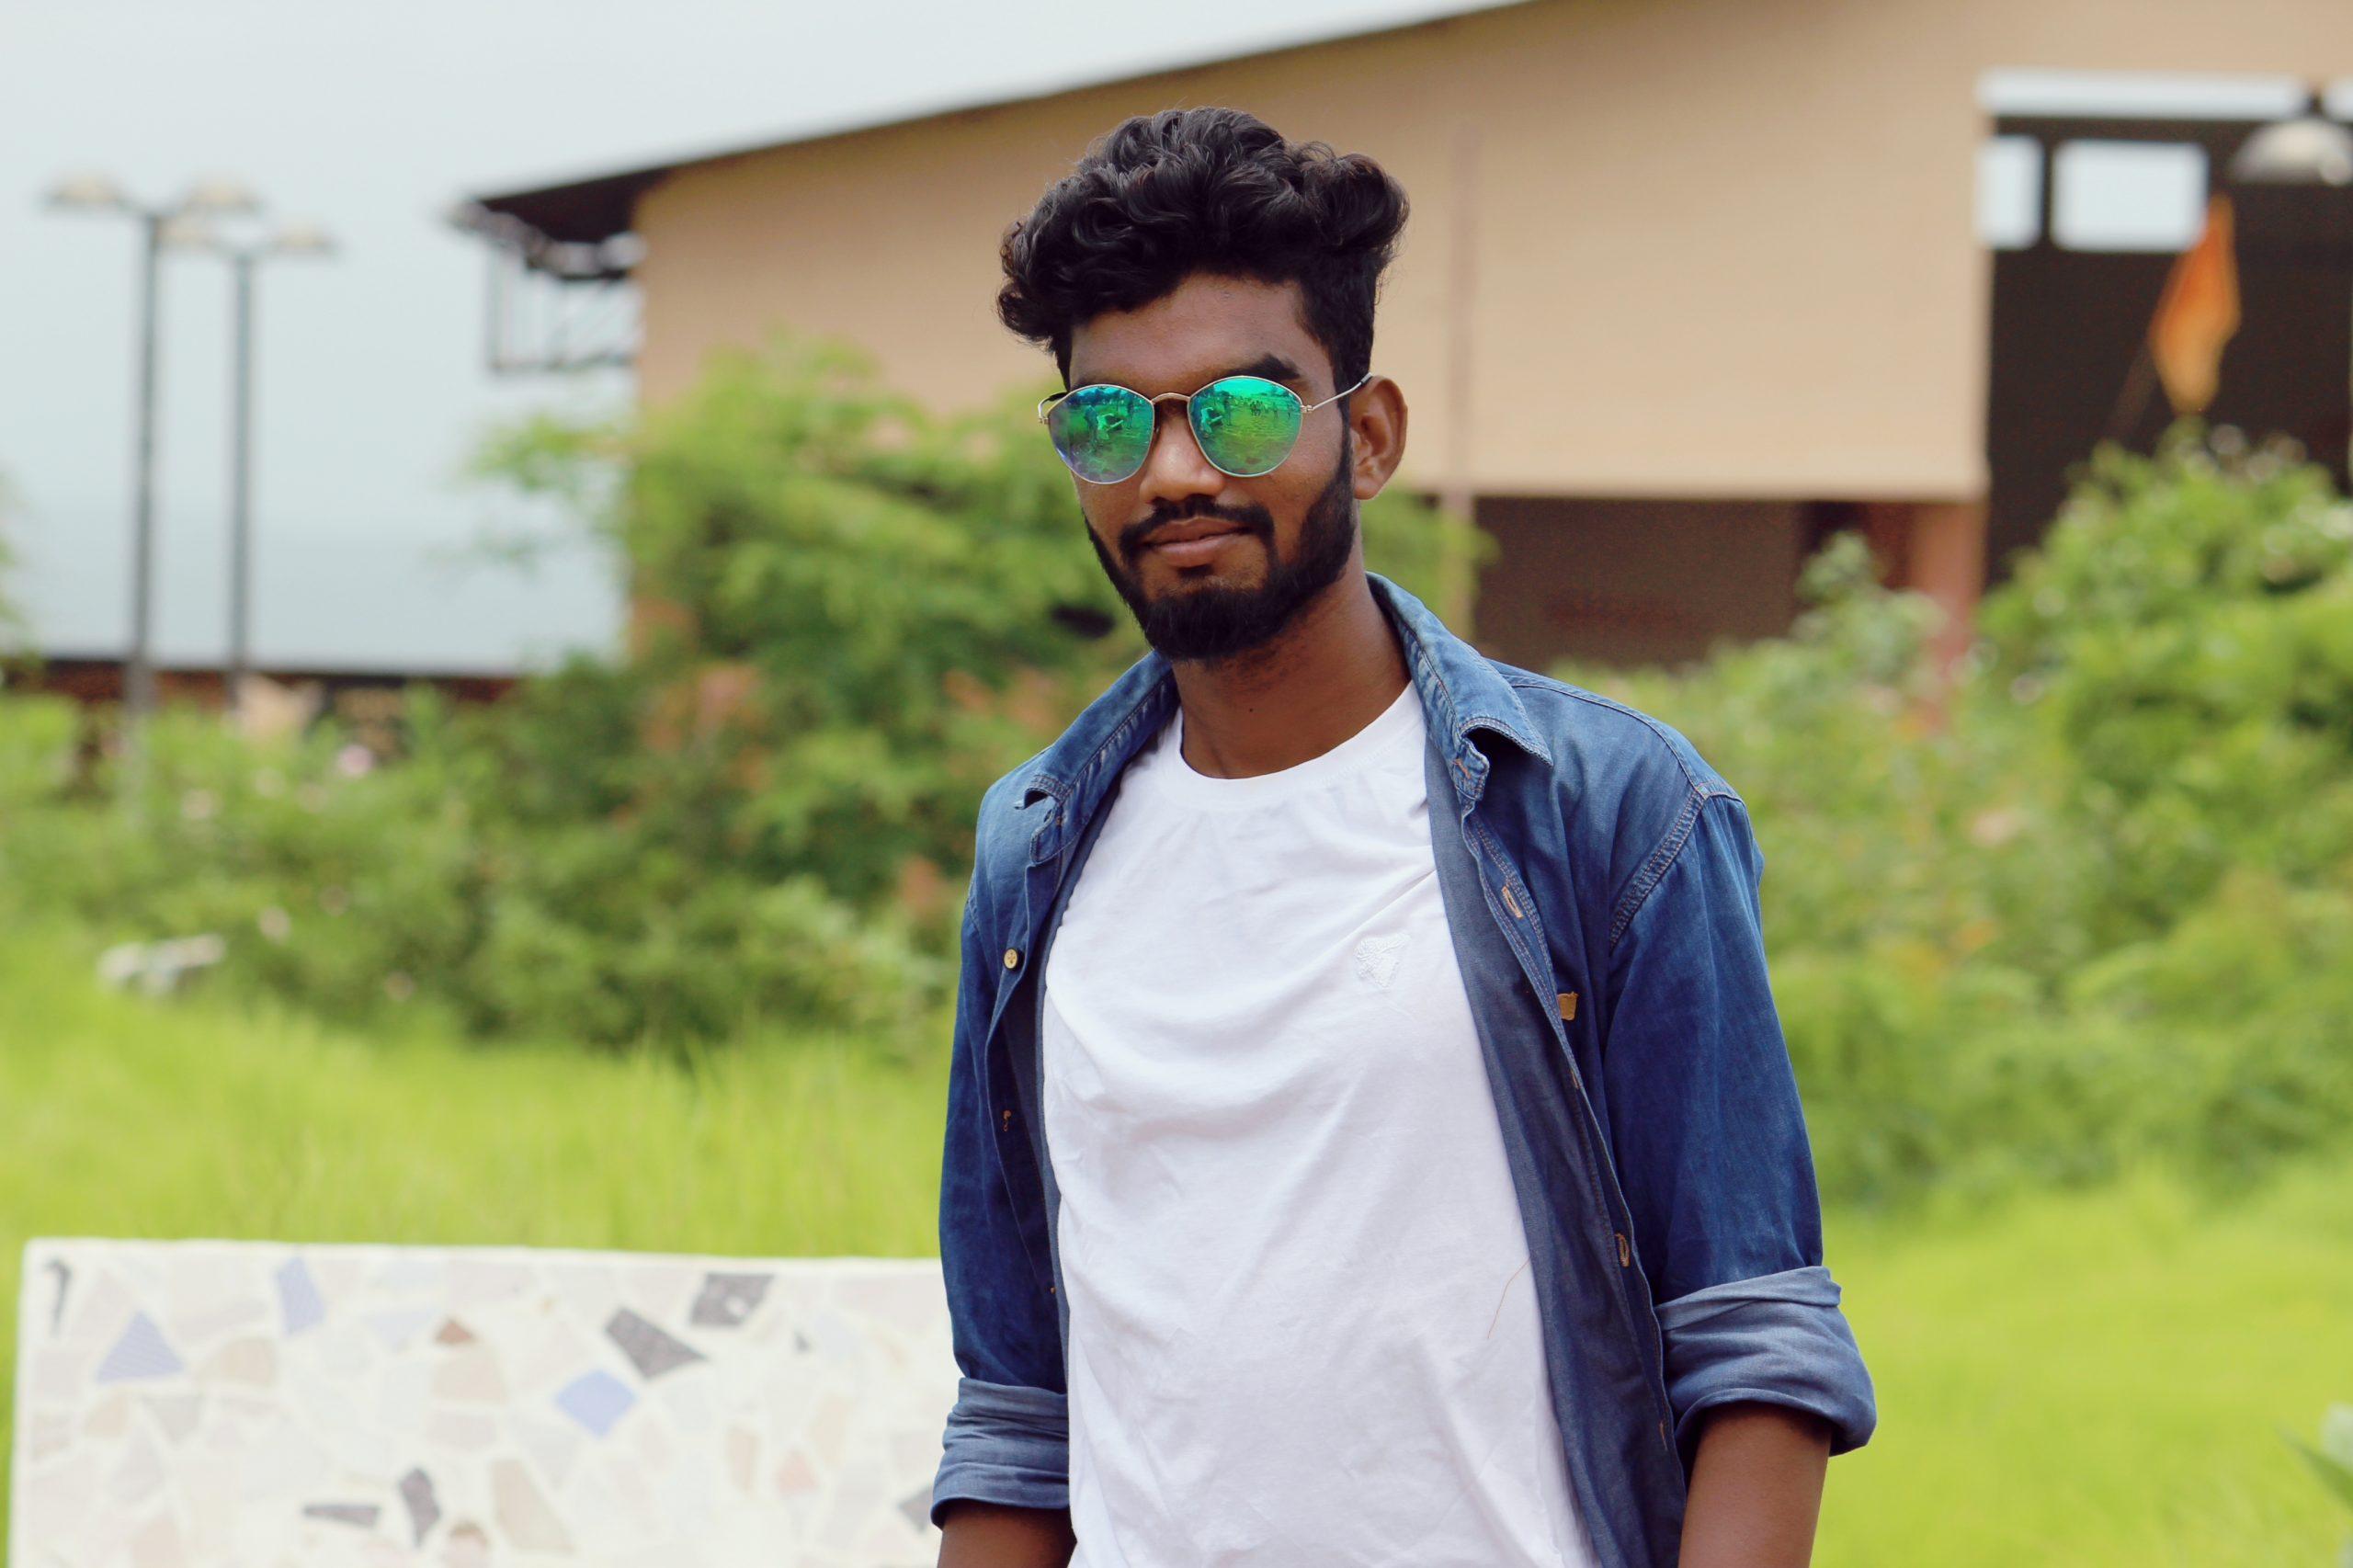 Stylish boy posing with sunglasses